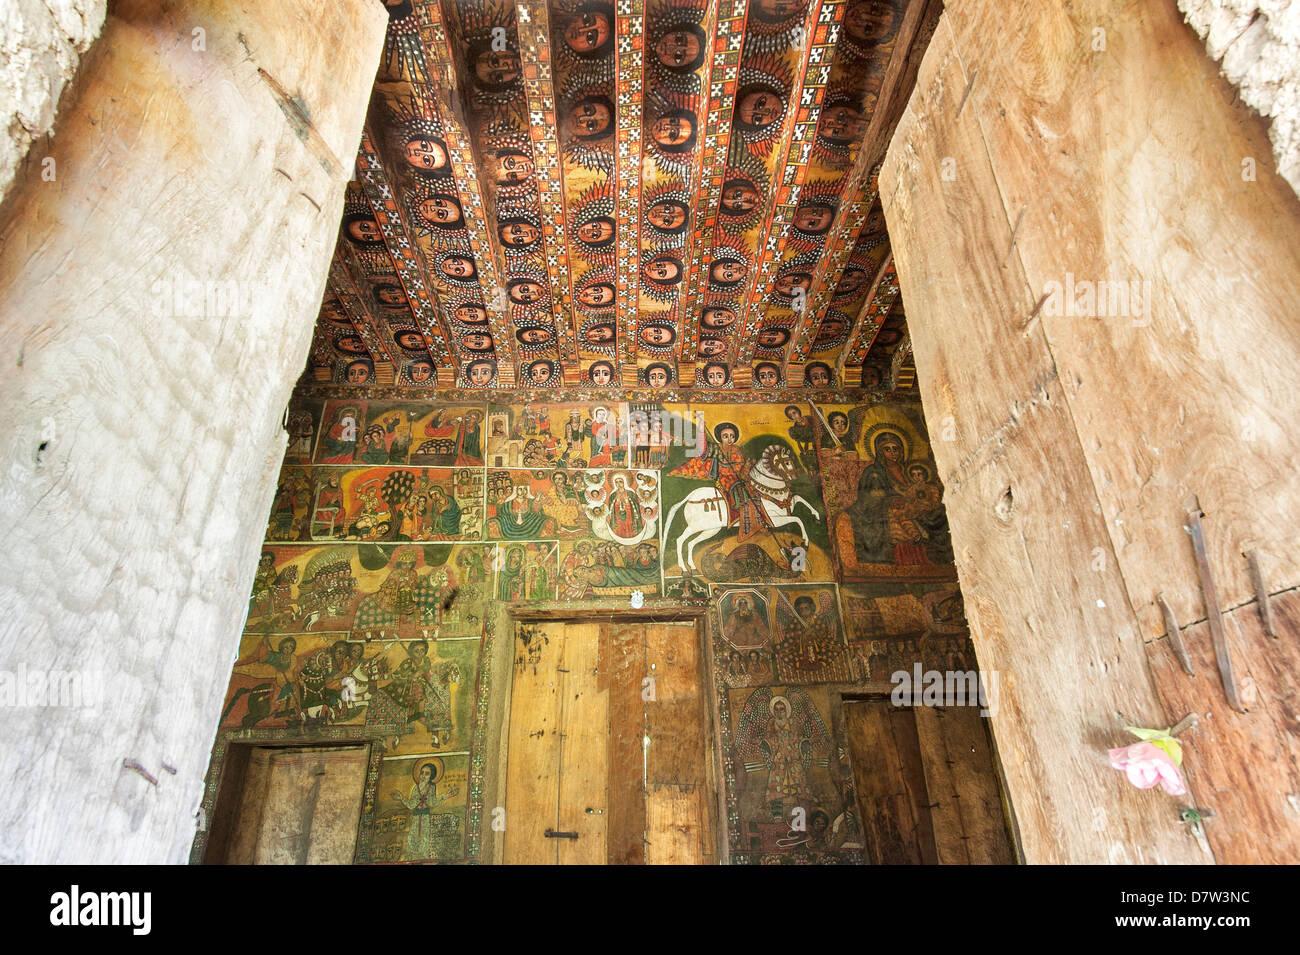 Ancient wall paintings inside the Debre Birhan Selassie Church, Gondar, Ethiopia - Stock Image